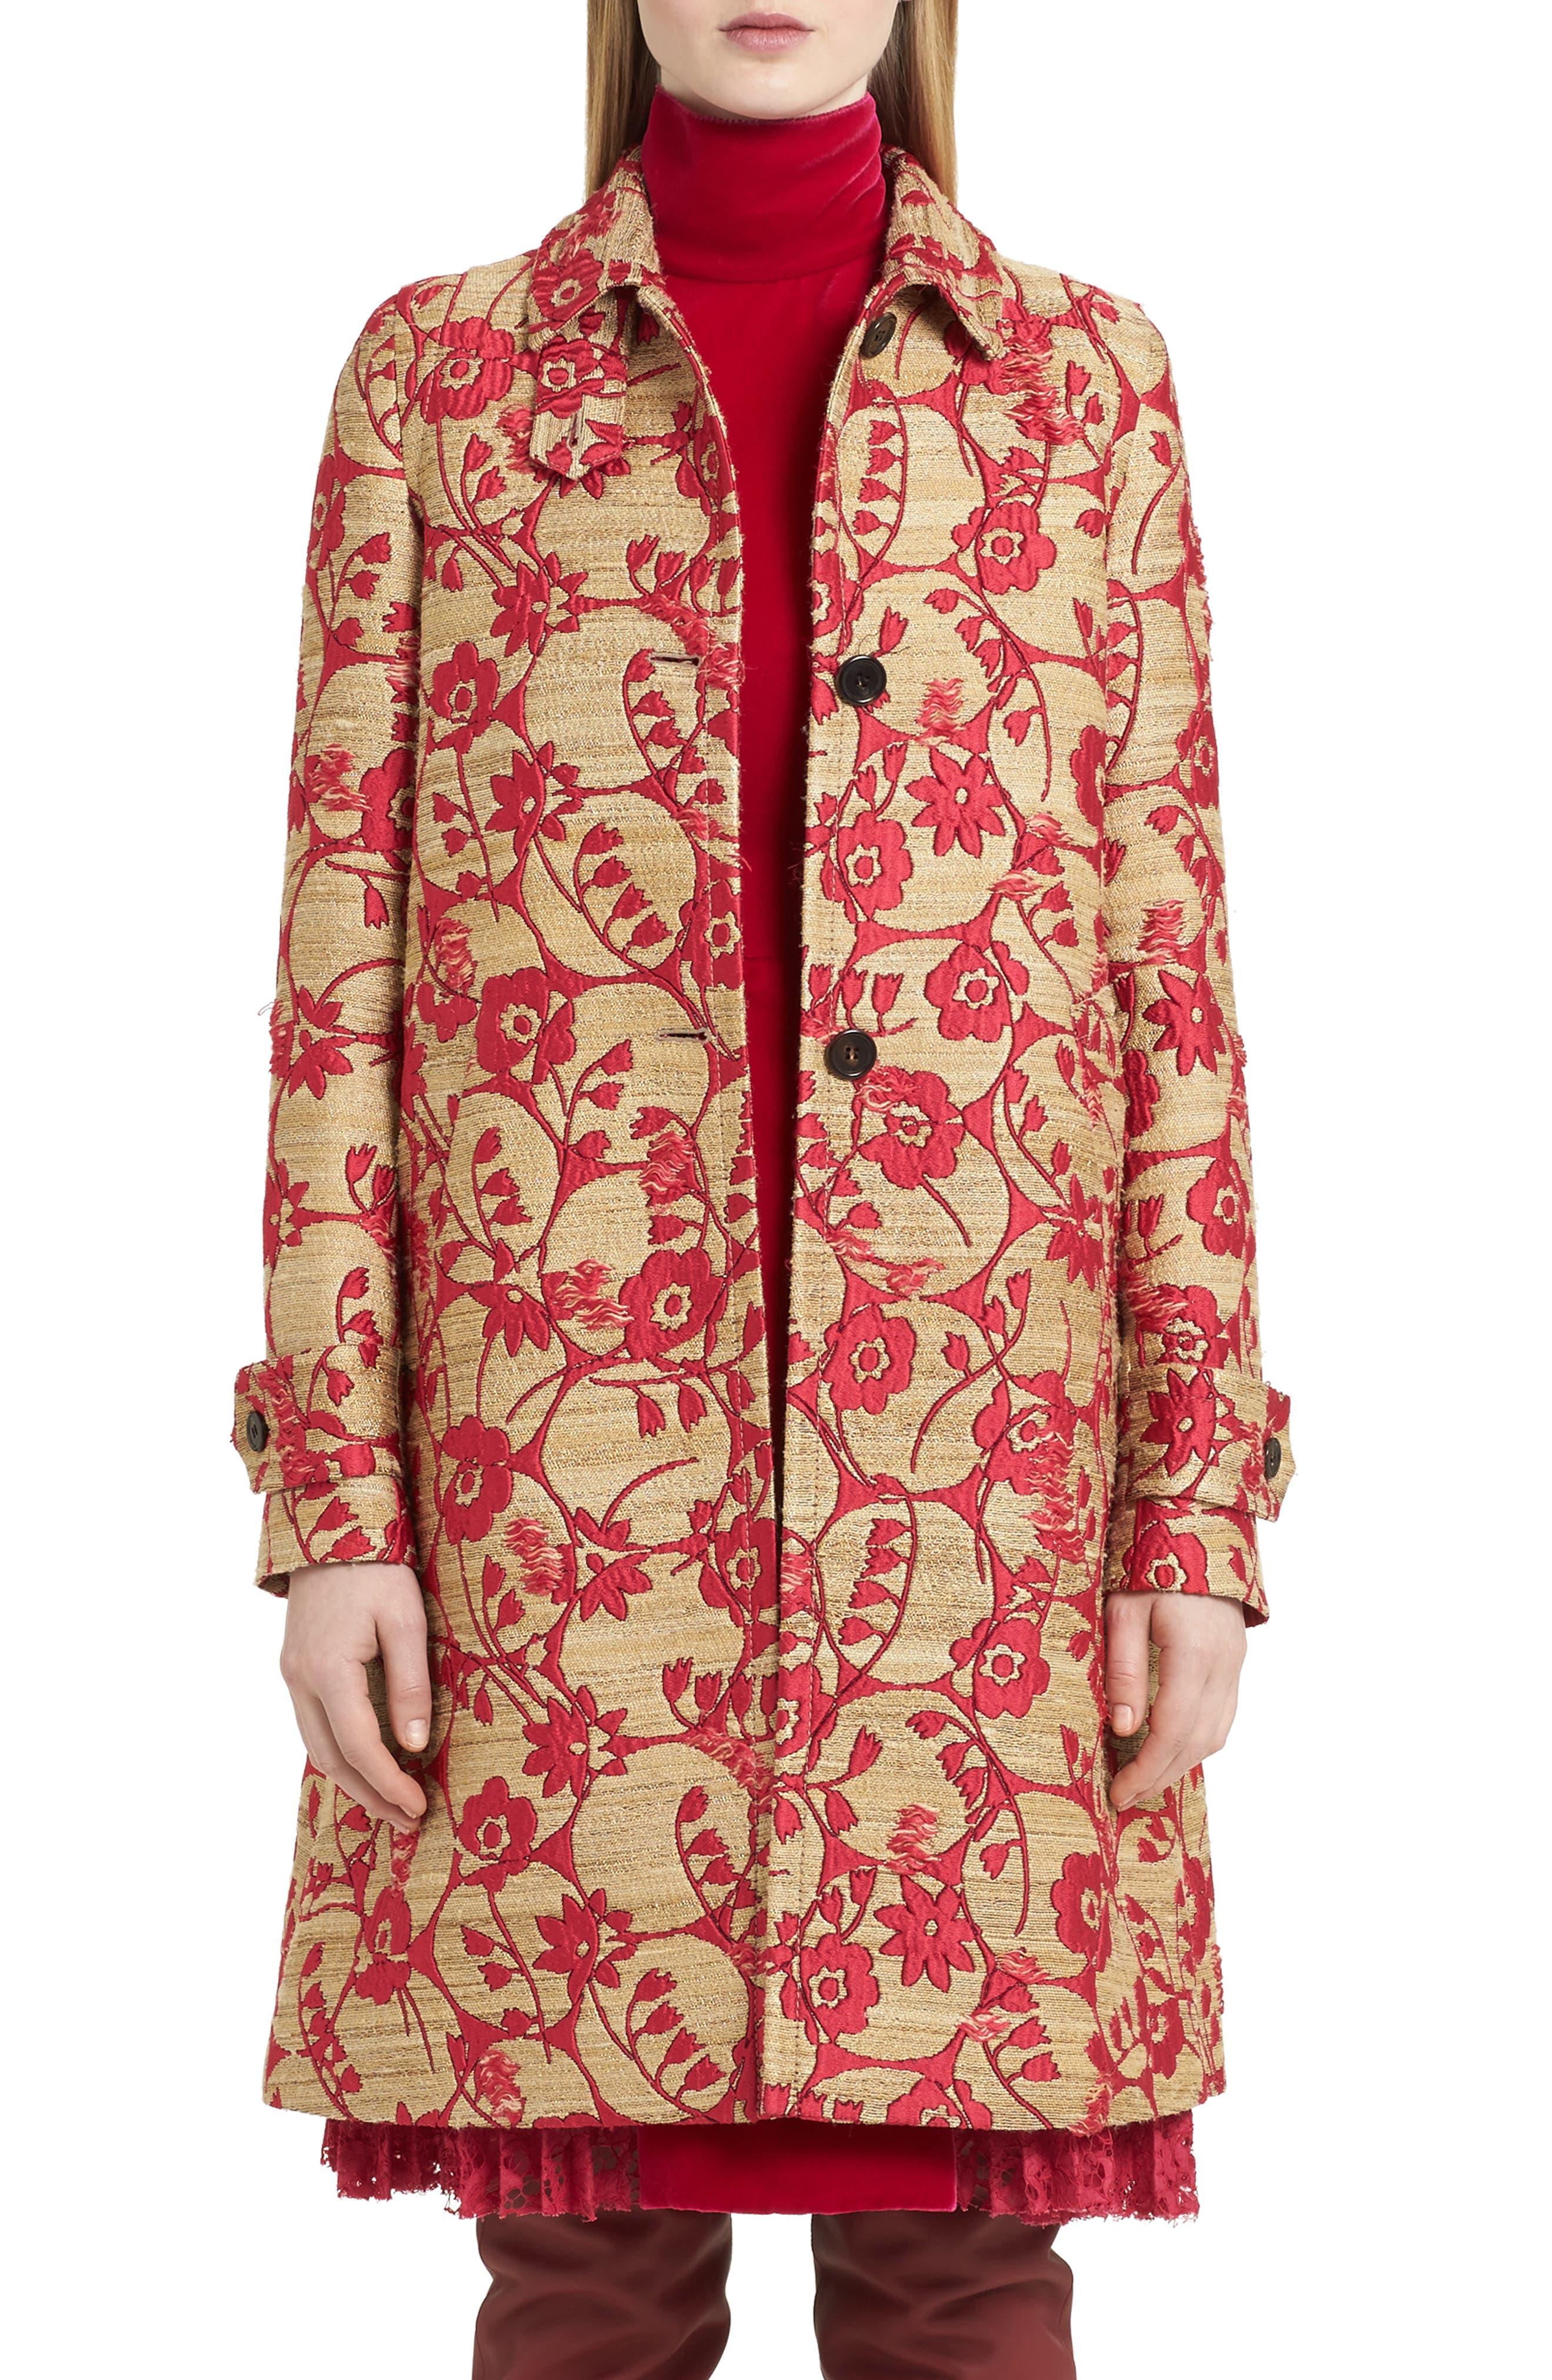 Valentino Flower Circles Jacquard Coat